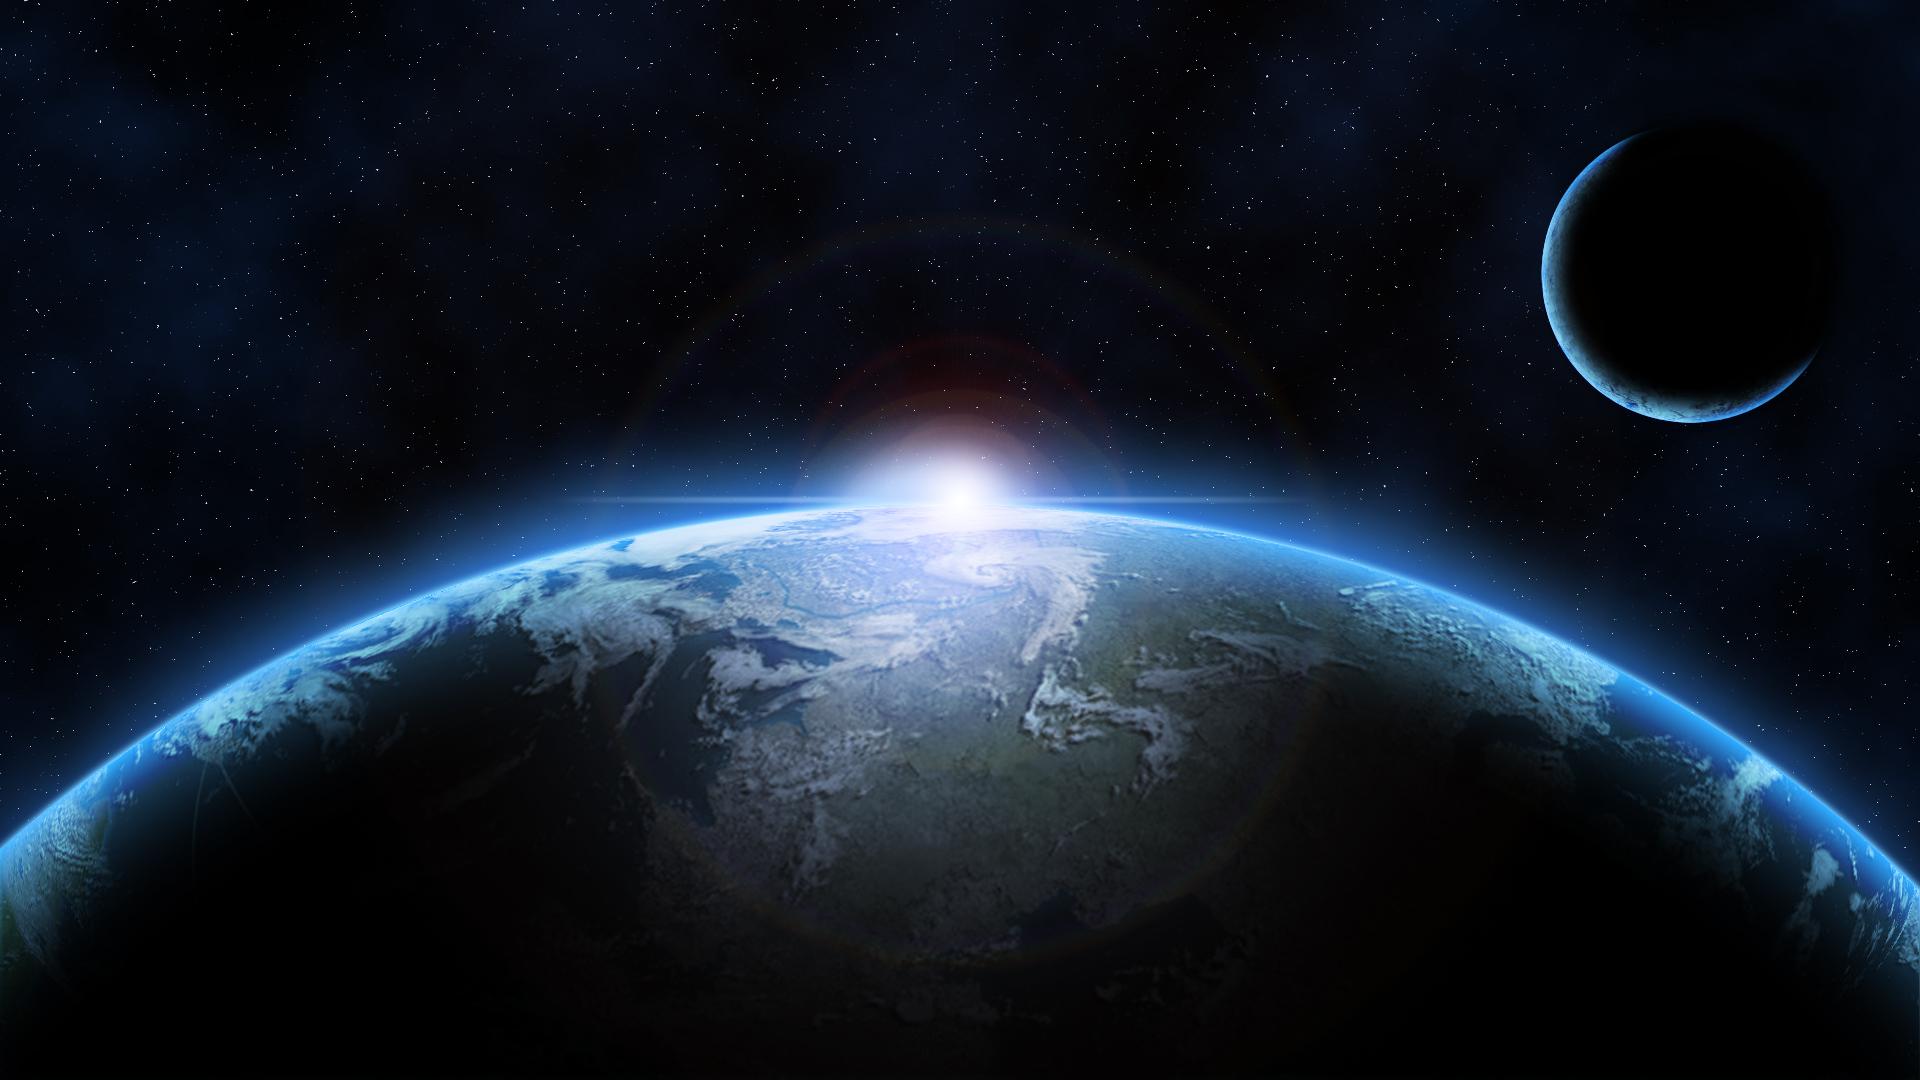 download plotinus on sense perception a philosophical study